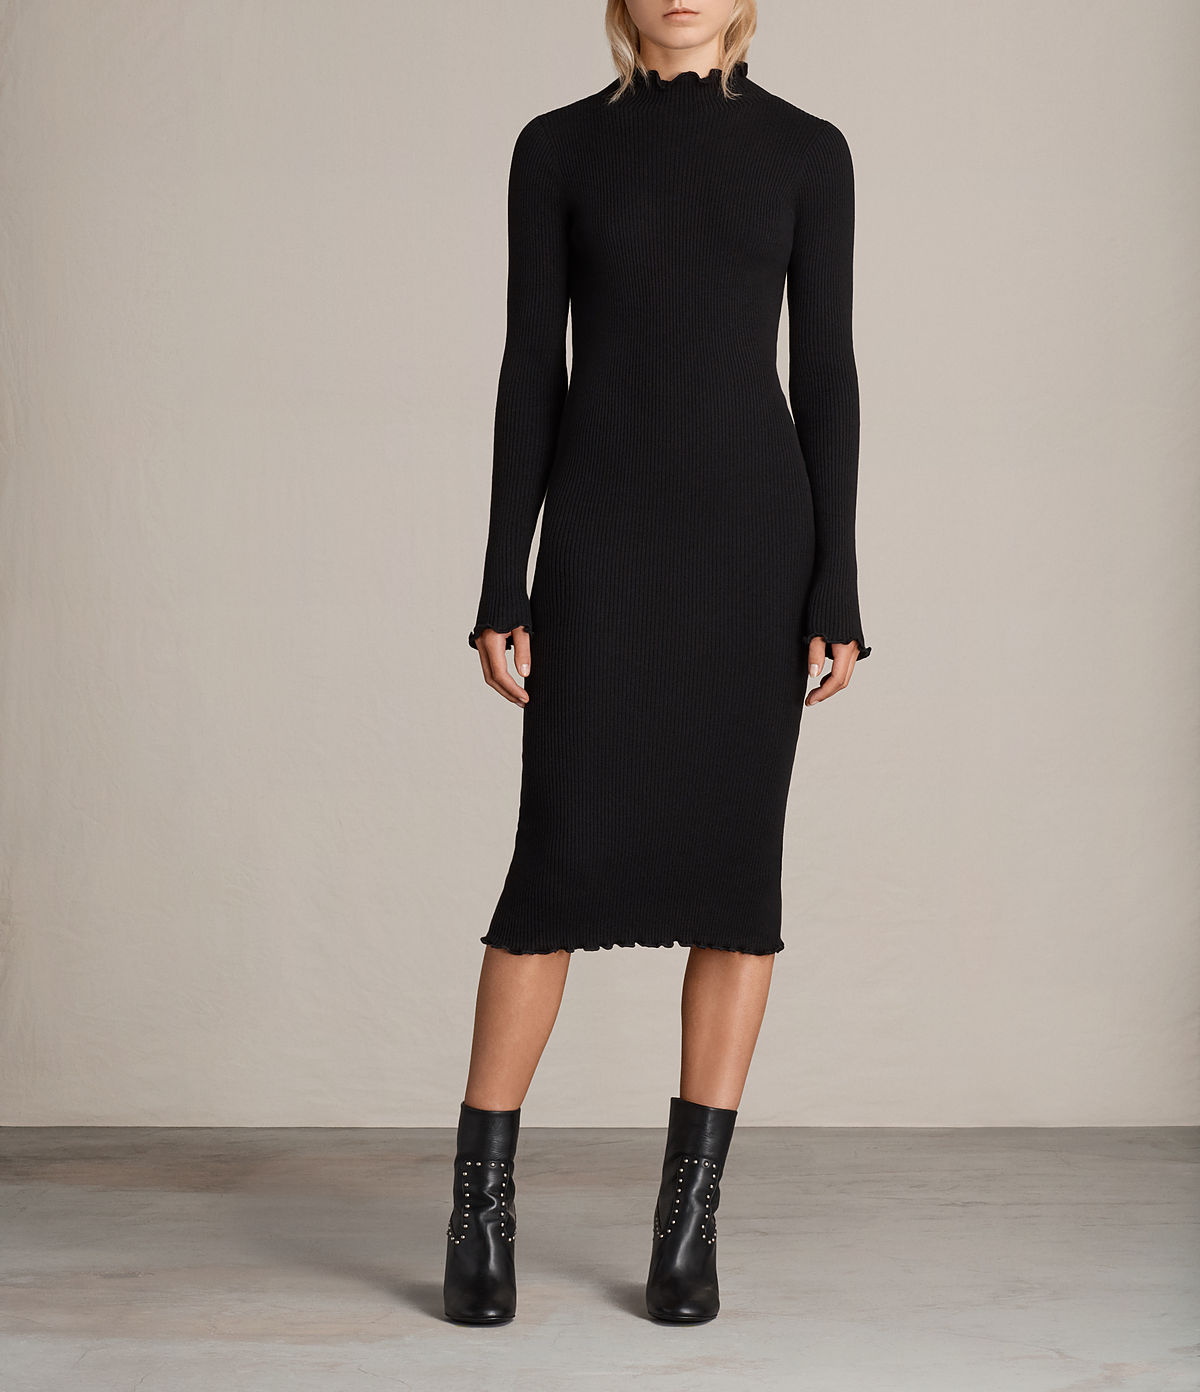 Kleider & Röcke Eli Frill Dress